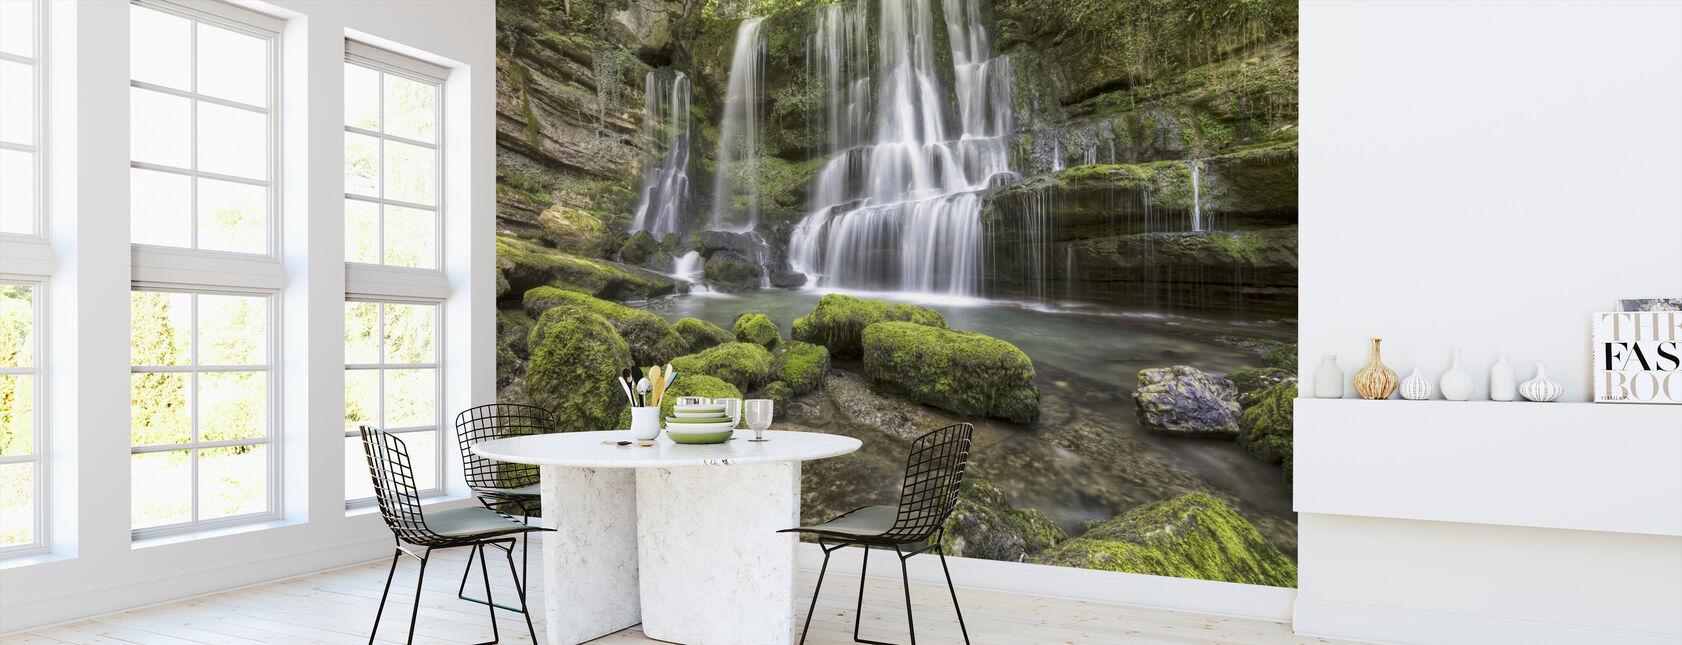 Waterfall of Verneau - Wallpaper - Kitchen